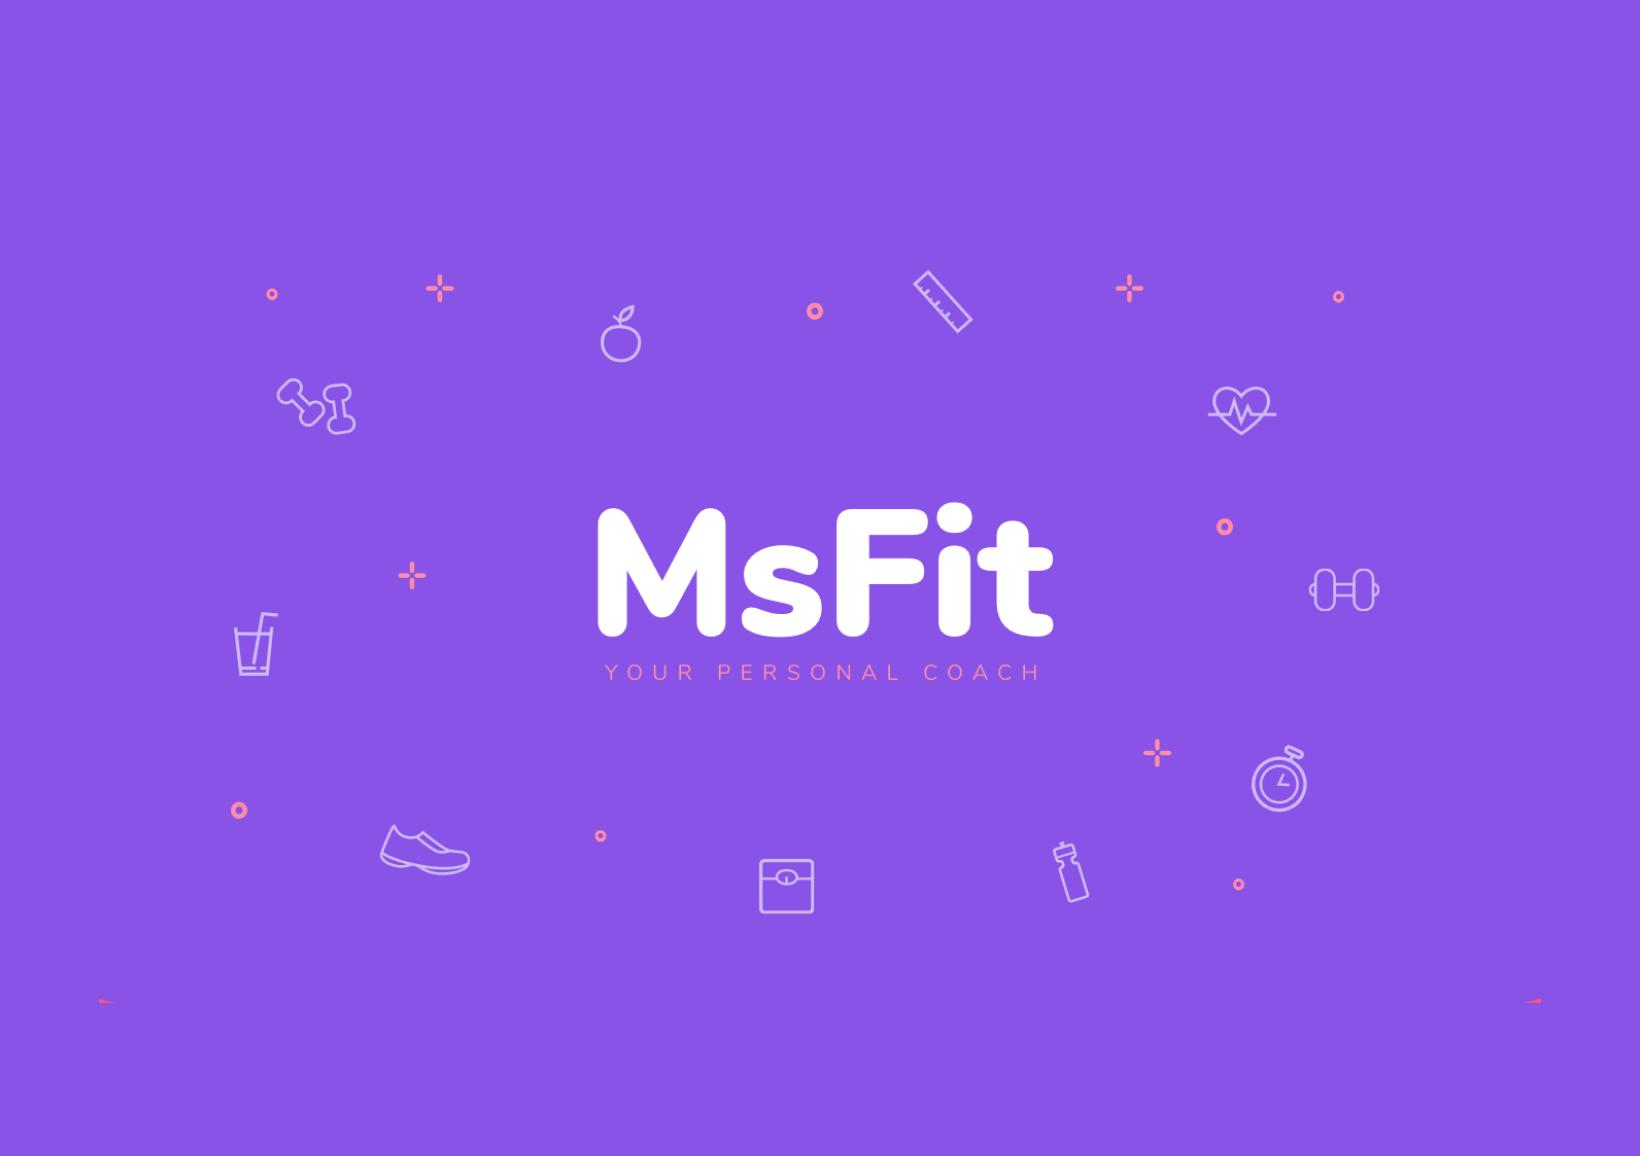 MSFit - online personal coach